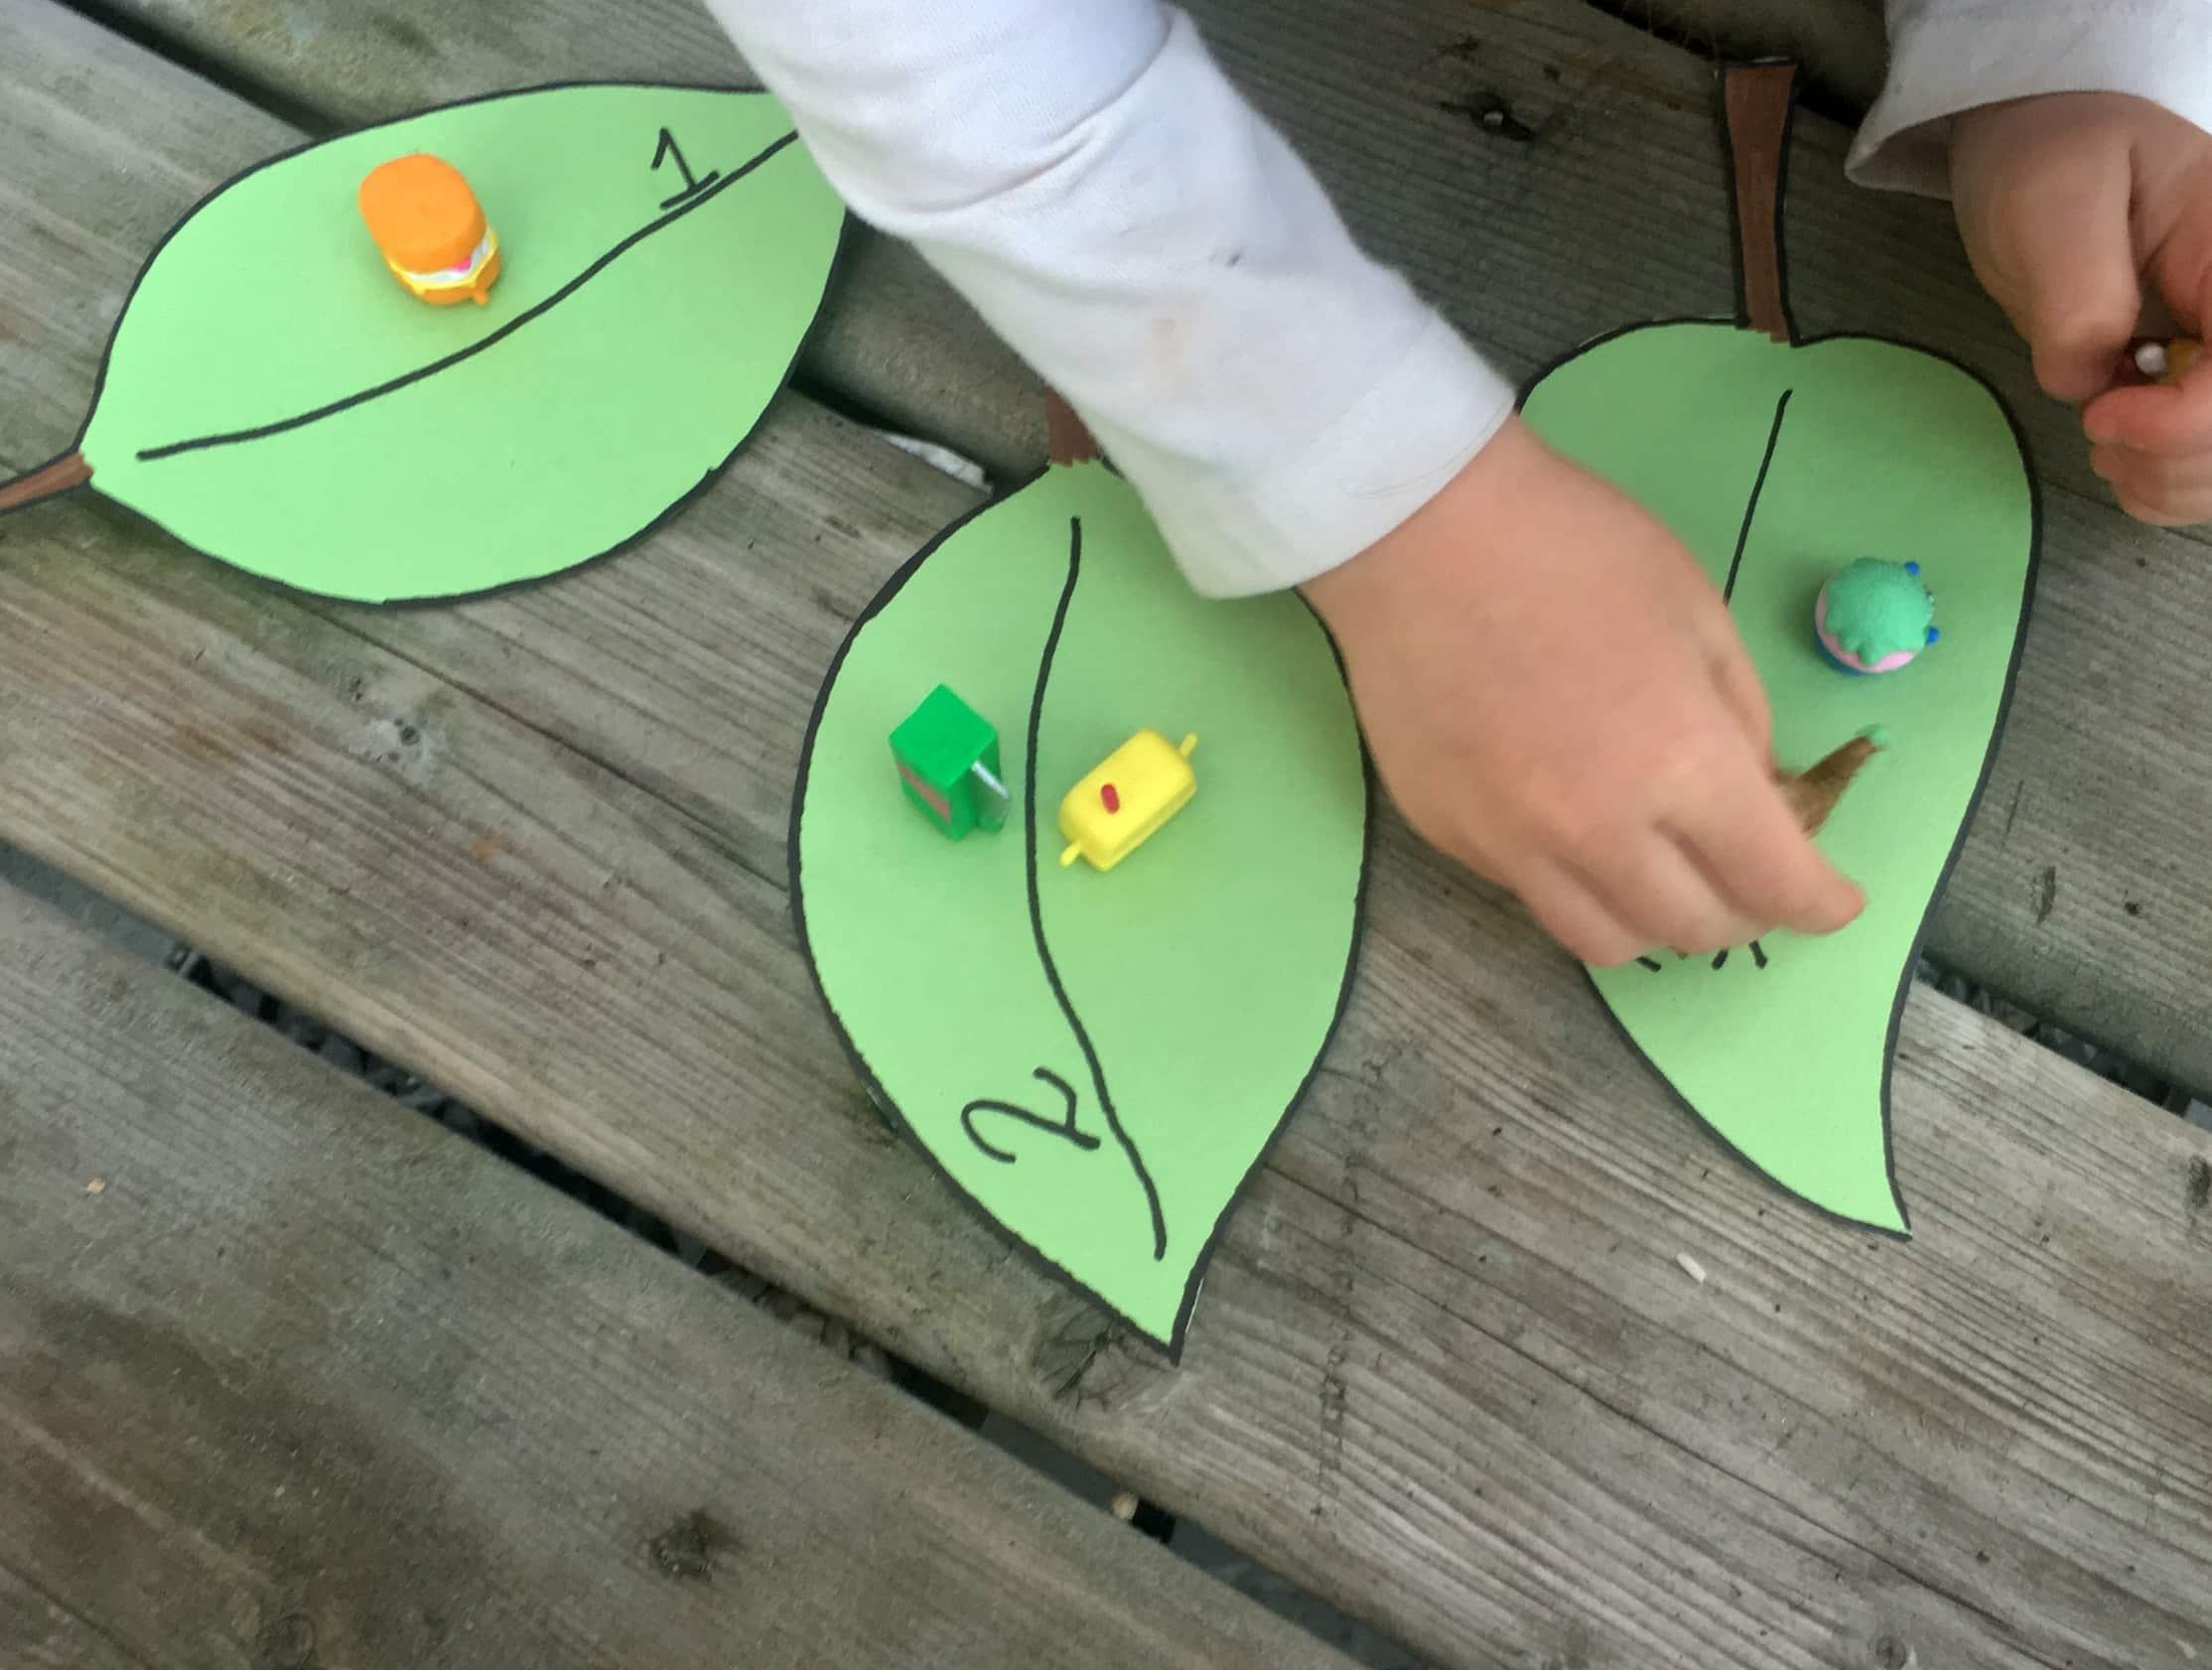 Learn with Shopkins: Teach Numeracy Using Manipulatives